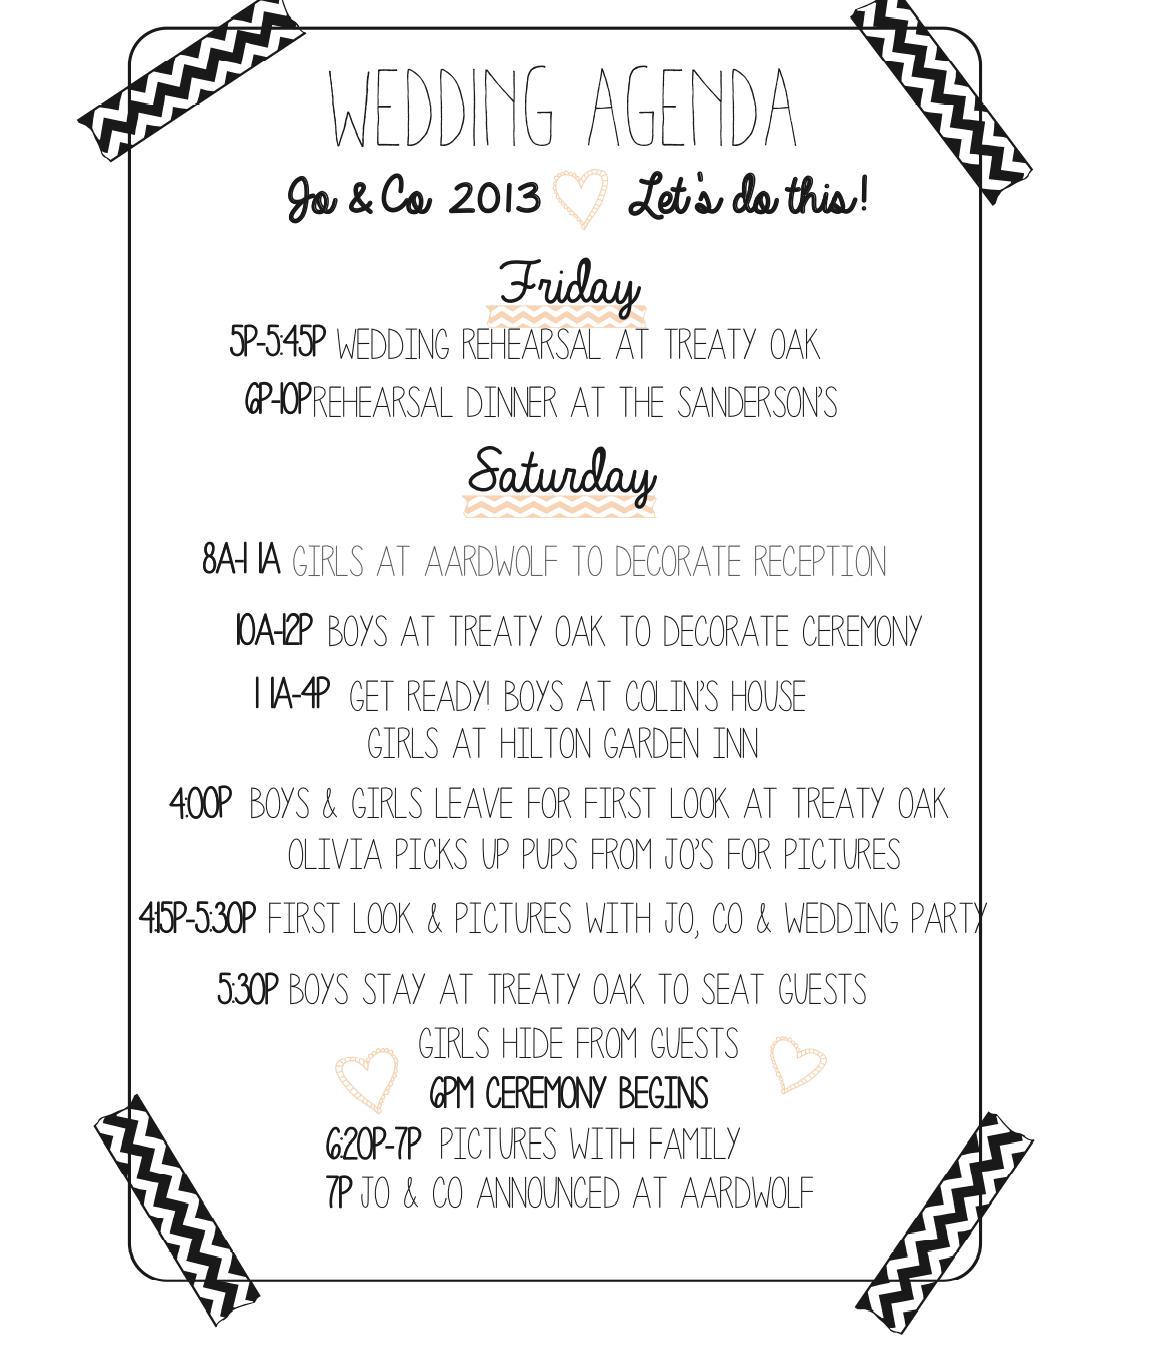 Wedding agenda sample